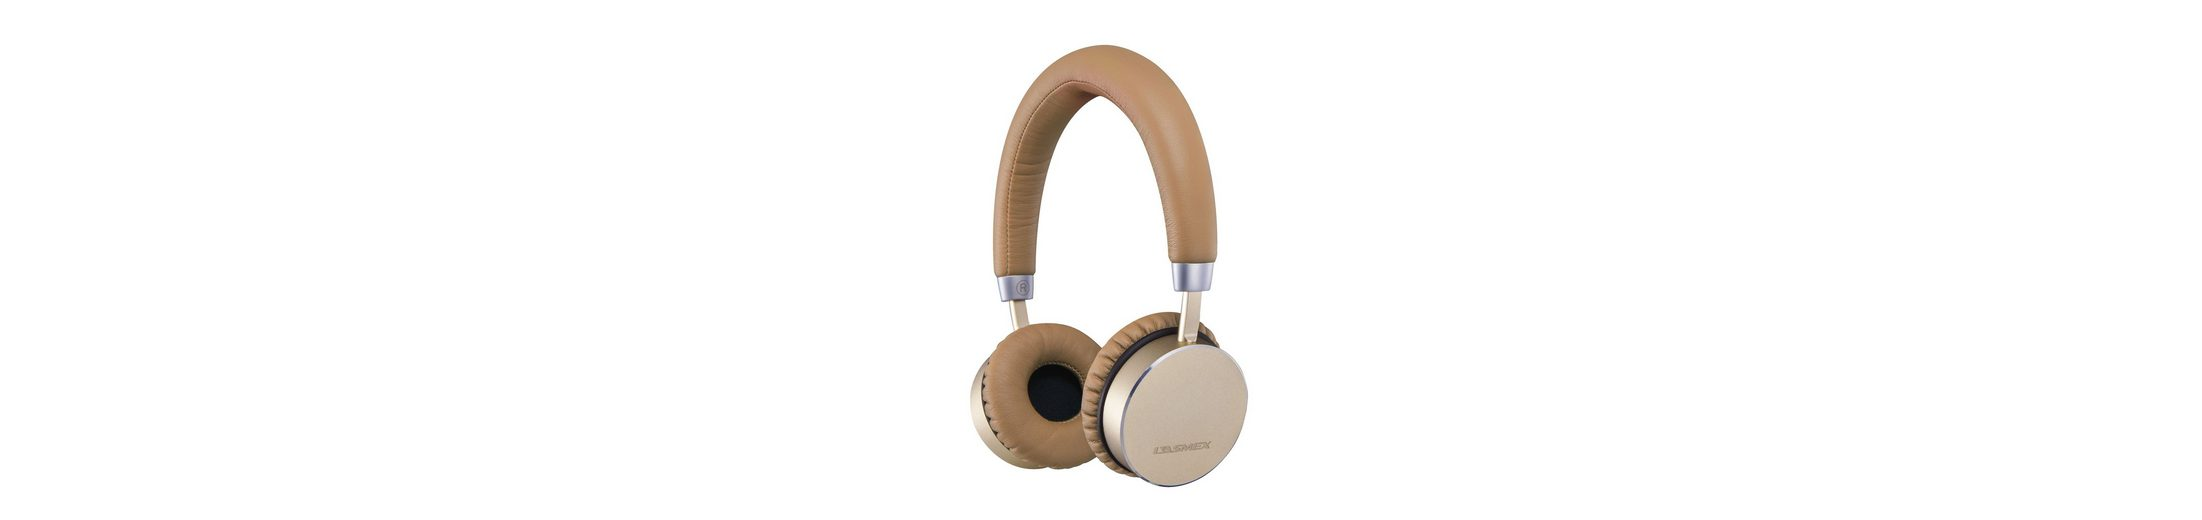 LASMEX Bluetooth Kopfhörer »HB-60 Bluetooth Kopfhoerer (HB-60)«